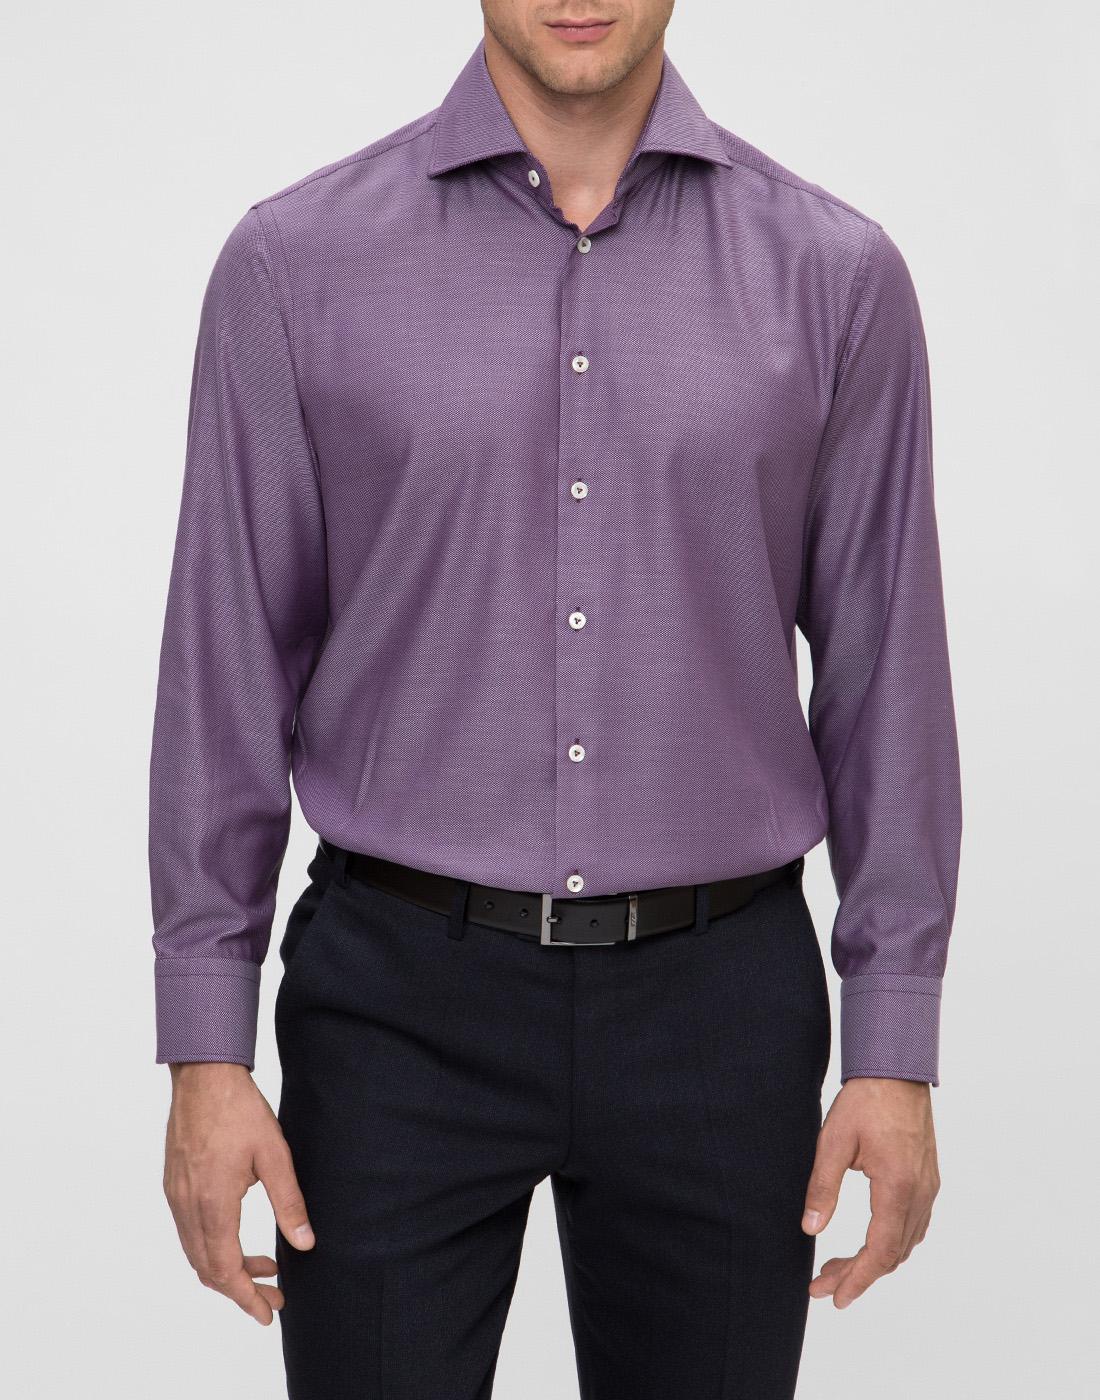 Мужская сиреневая рубашка Van Laack S151377/670-2